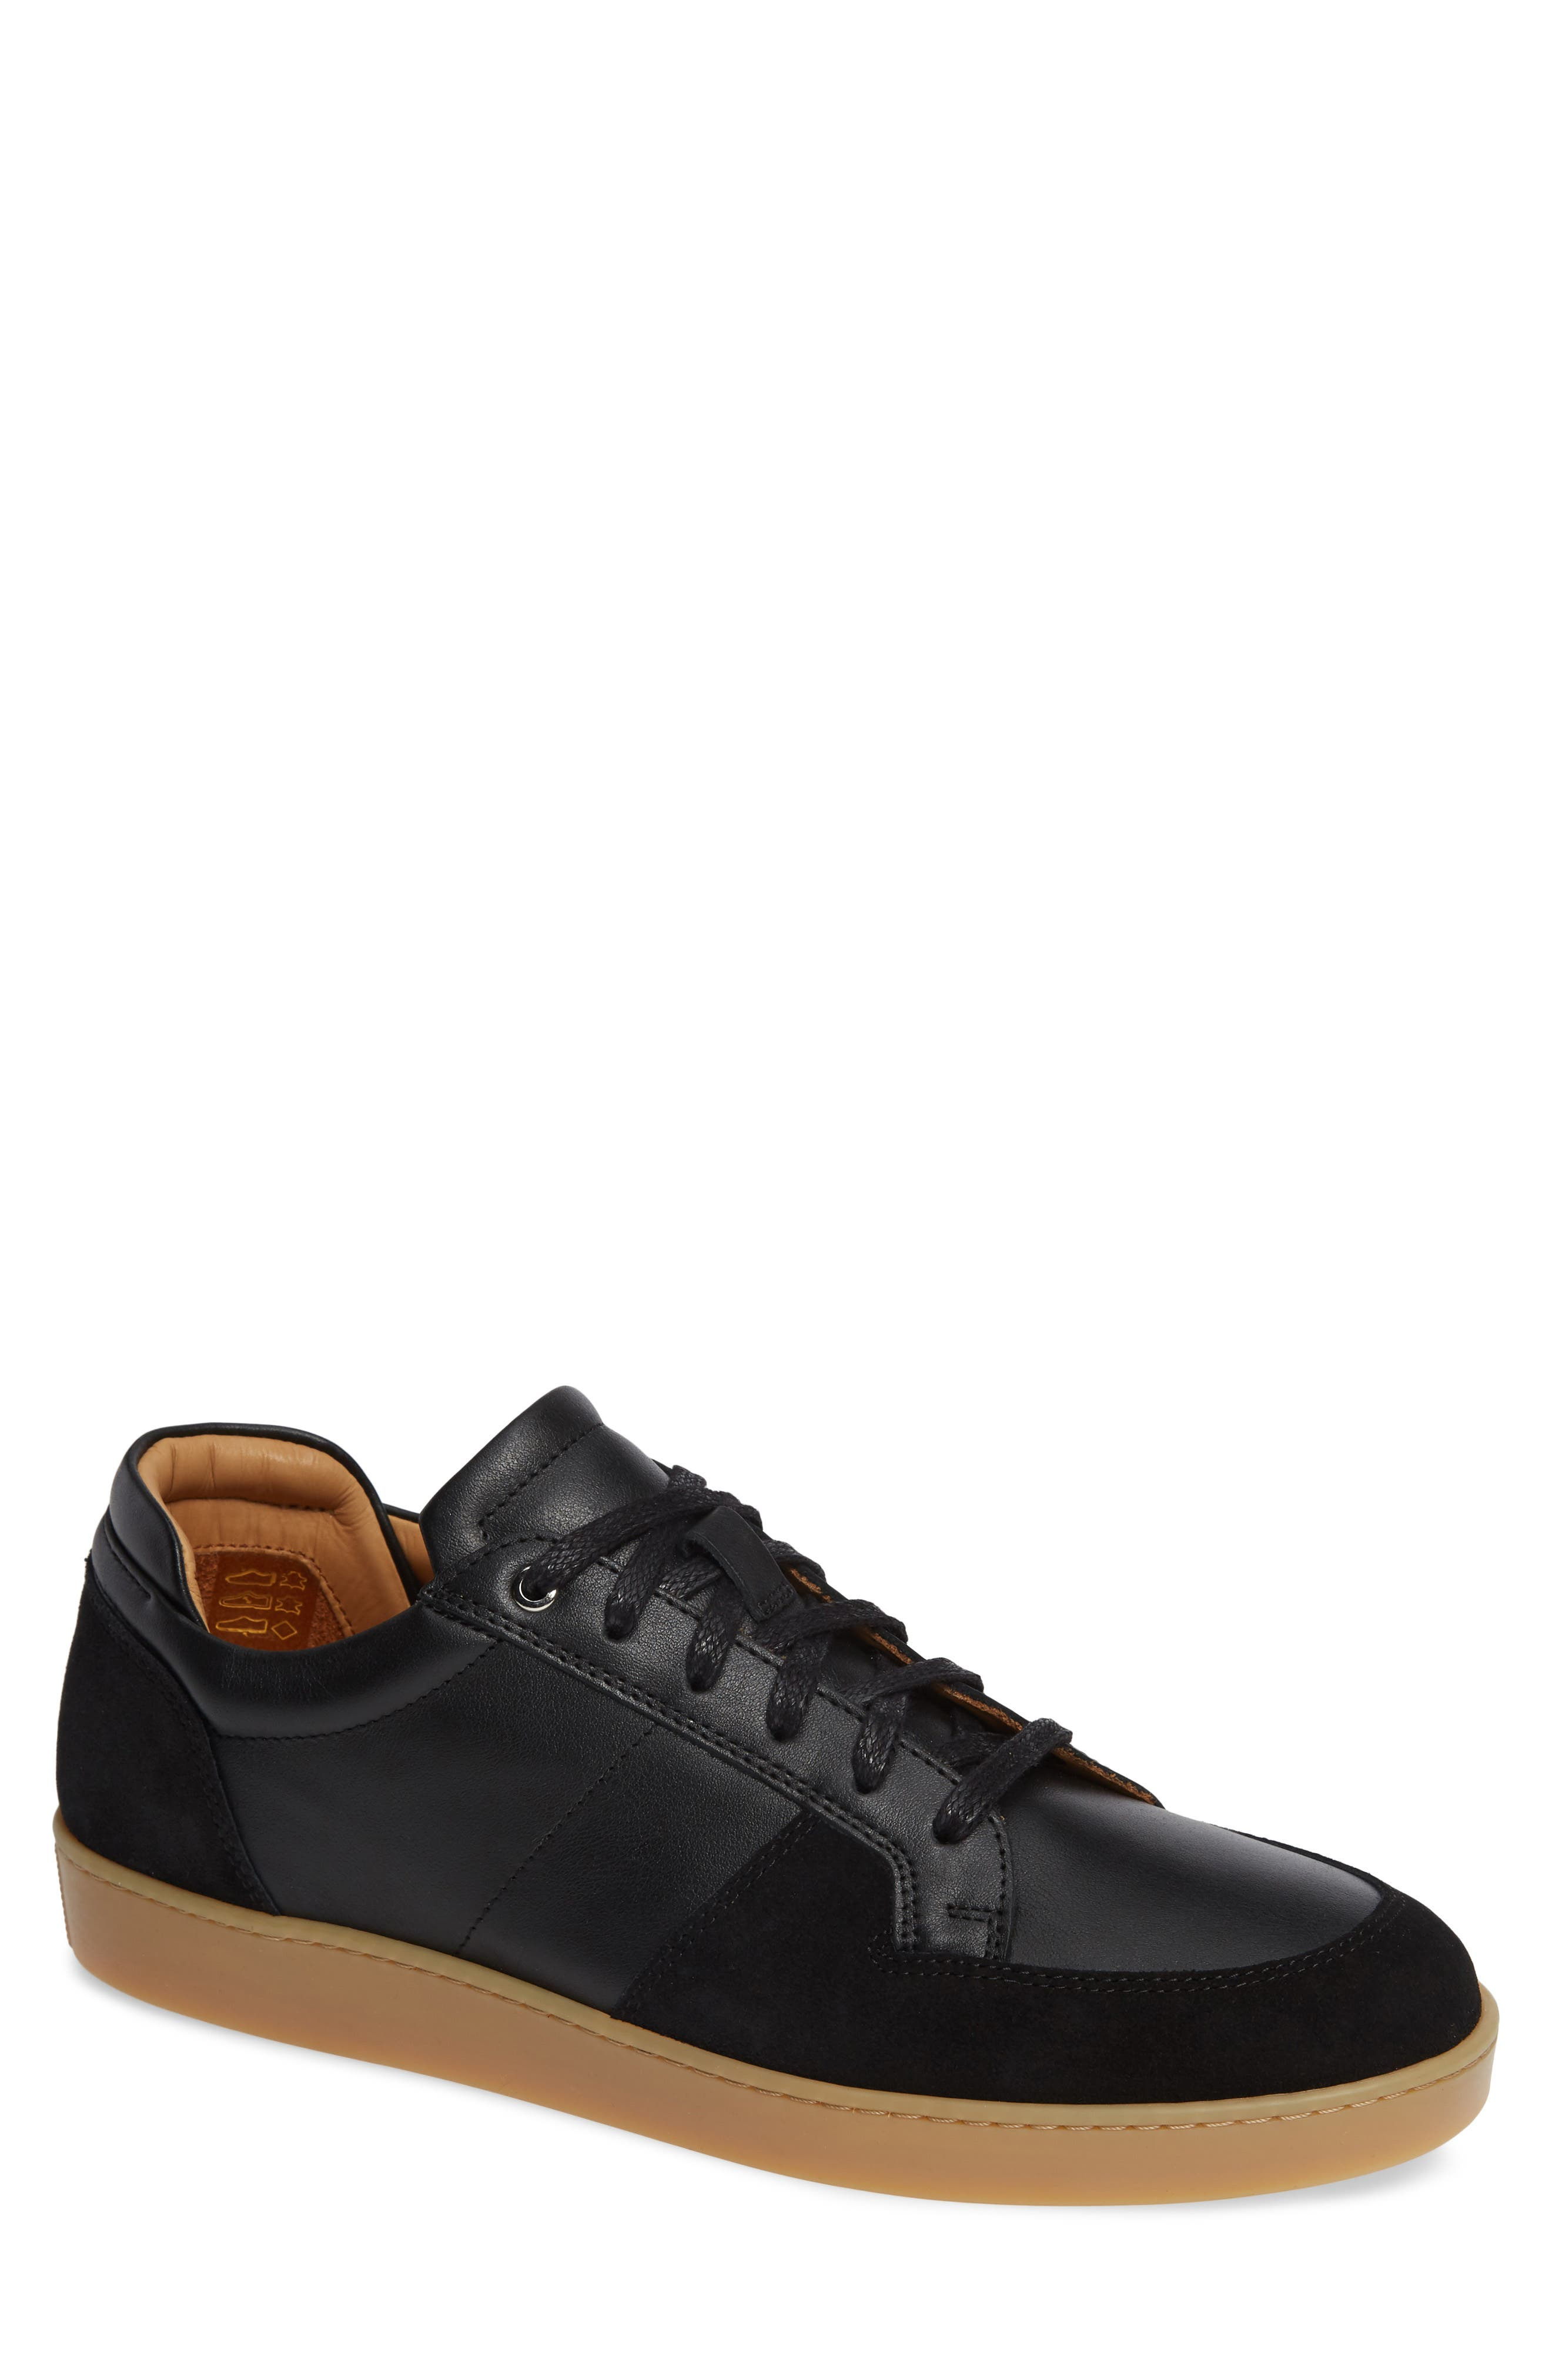 WANT LES ESSENTIELS DE LA VIE Wants Les Essentiels Lydd Sneaker in Black/ Black Suede